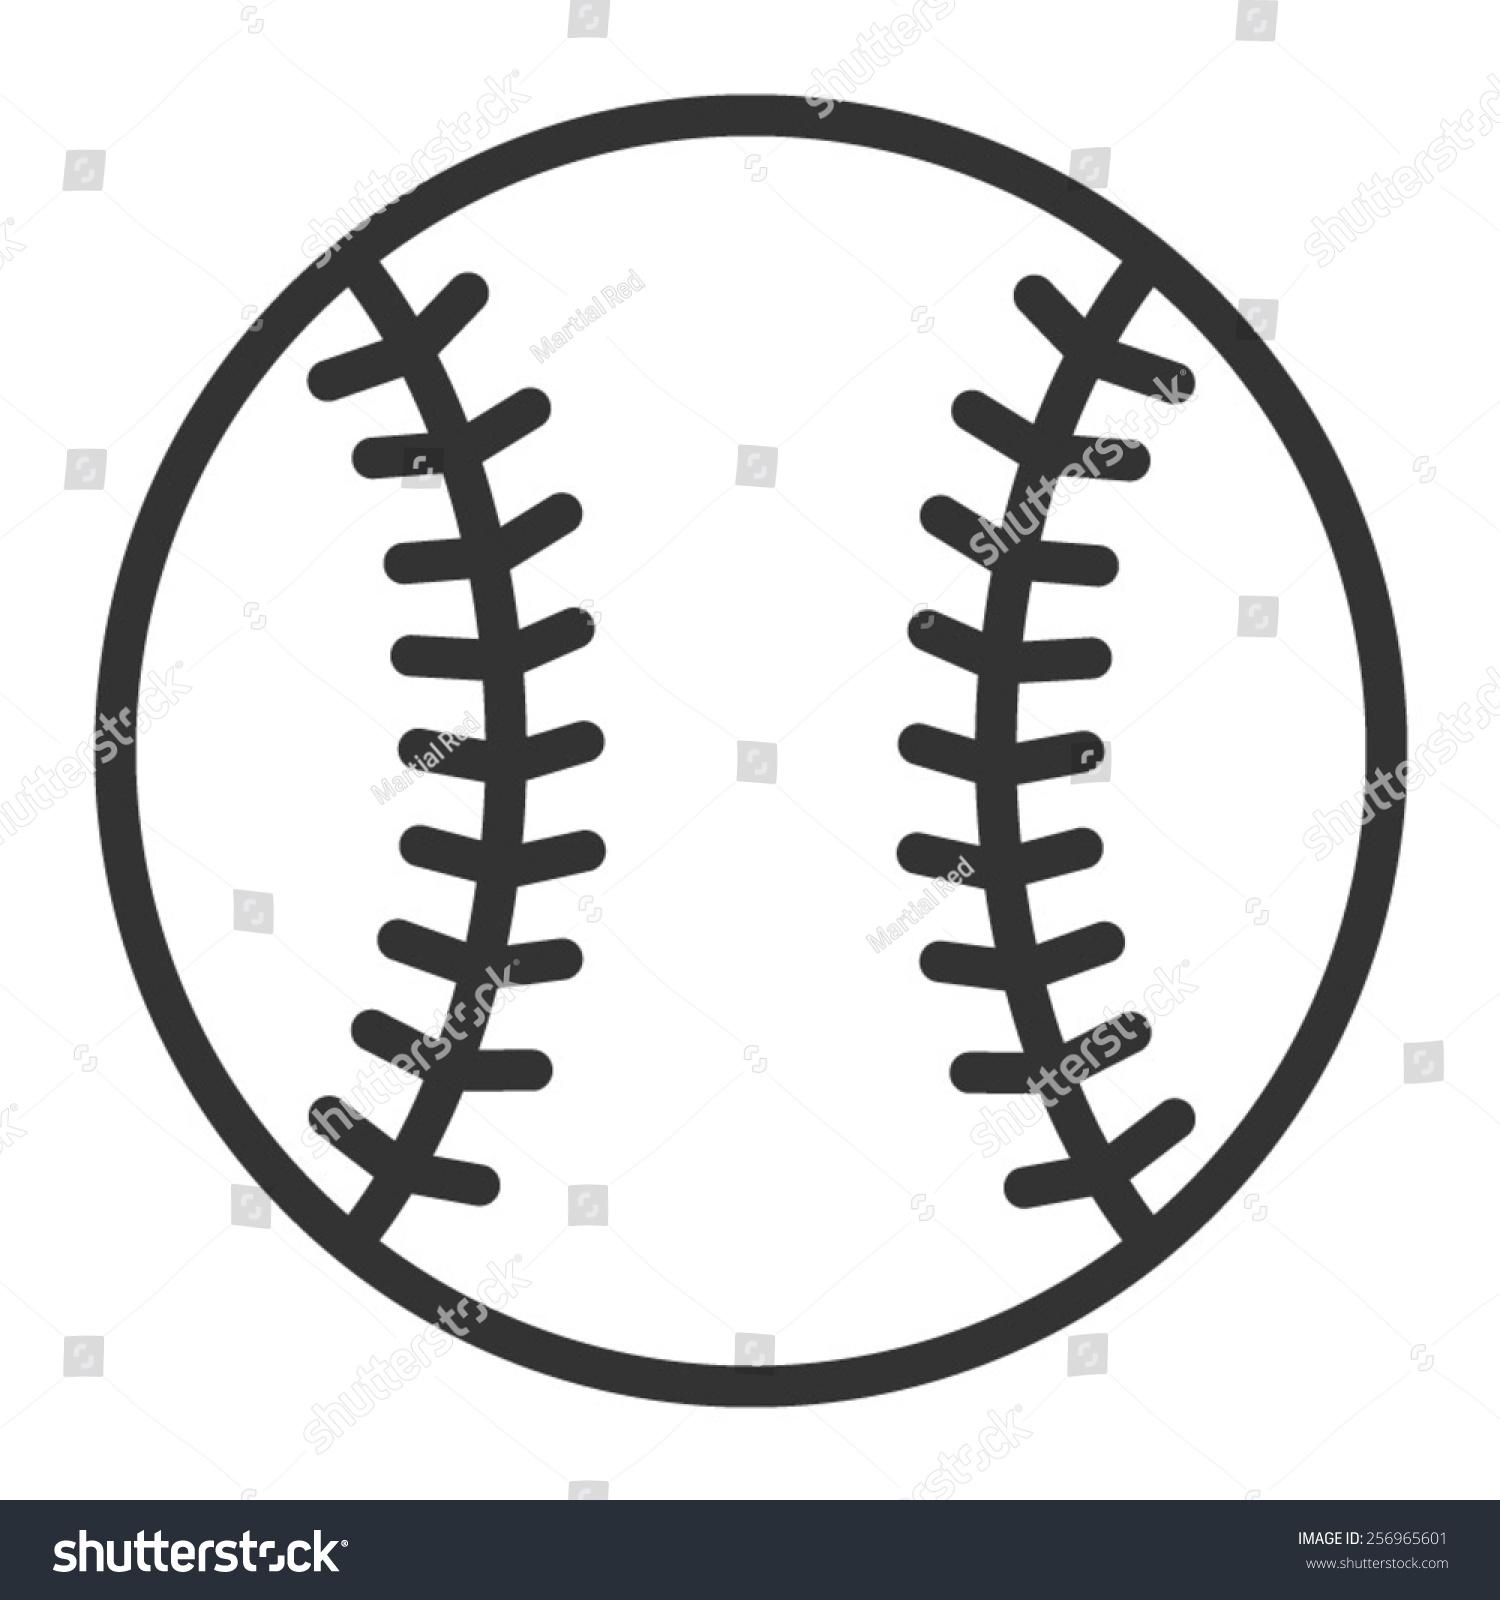 Baseball Baseball Homerun Line Art Icon Stock Vector 256965601 ...